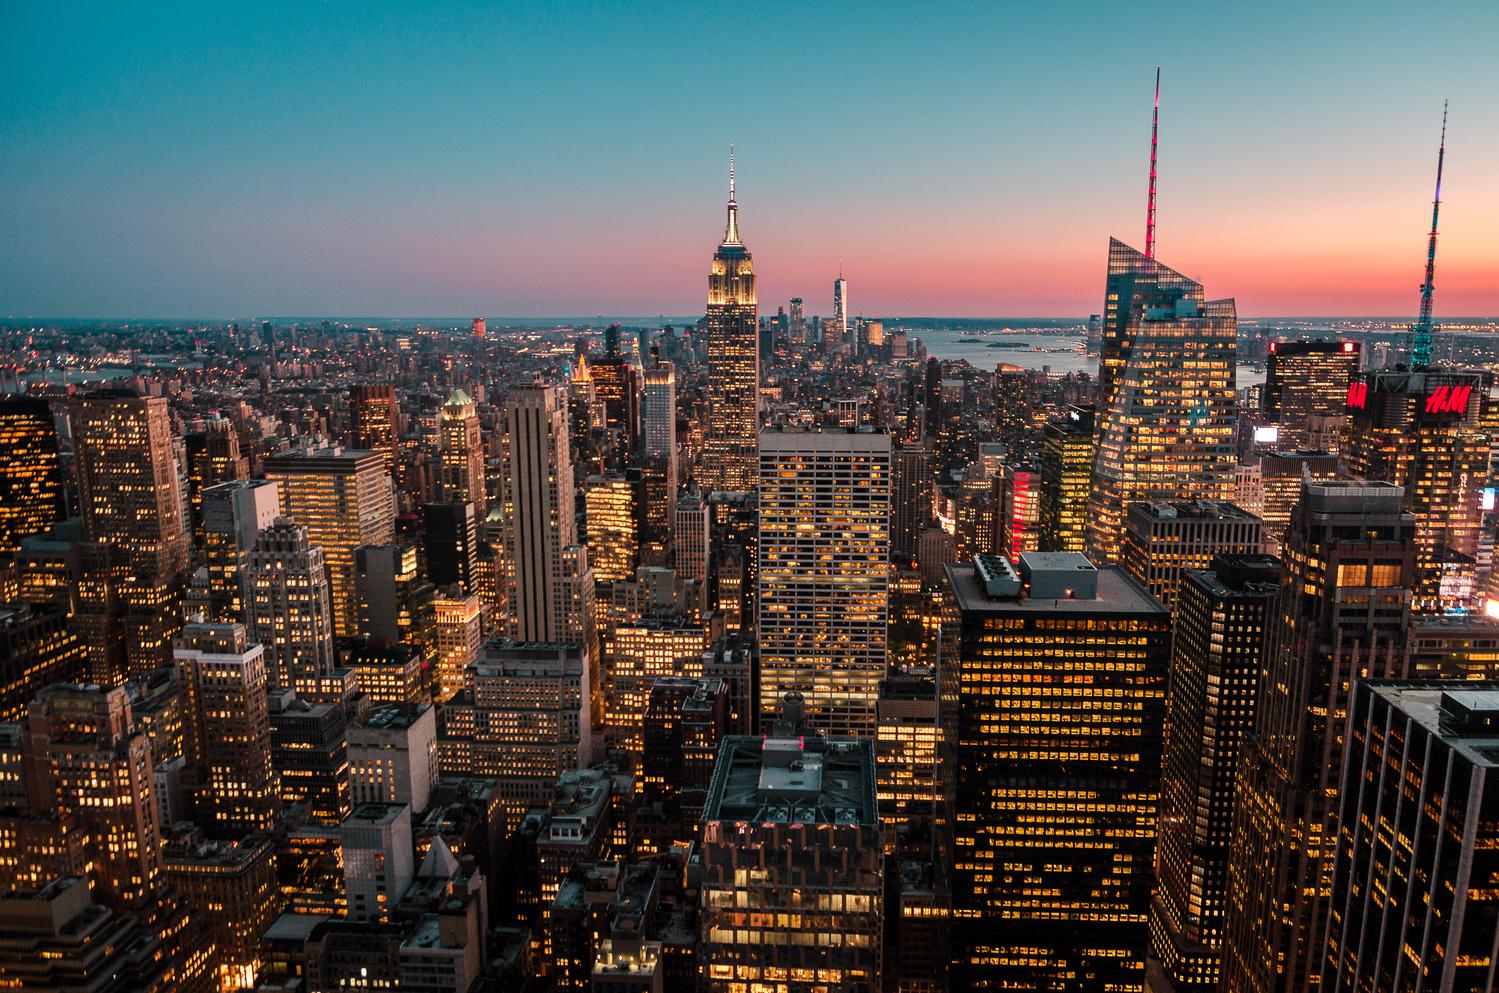 New York City Skyline by Thomas Brablec